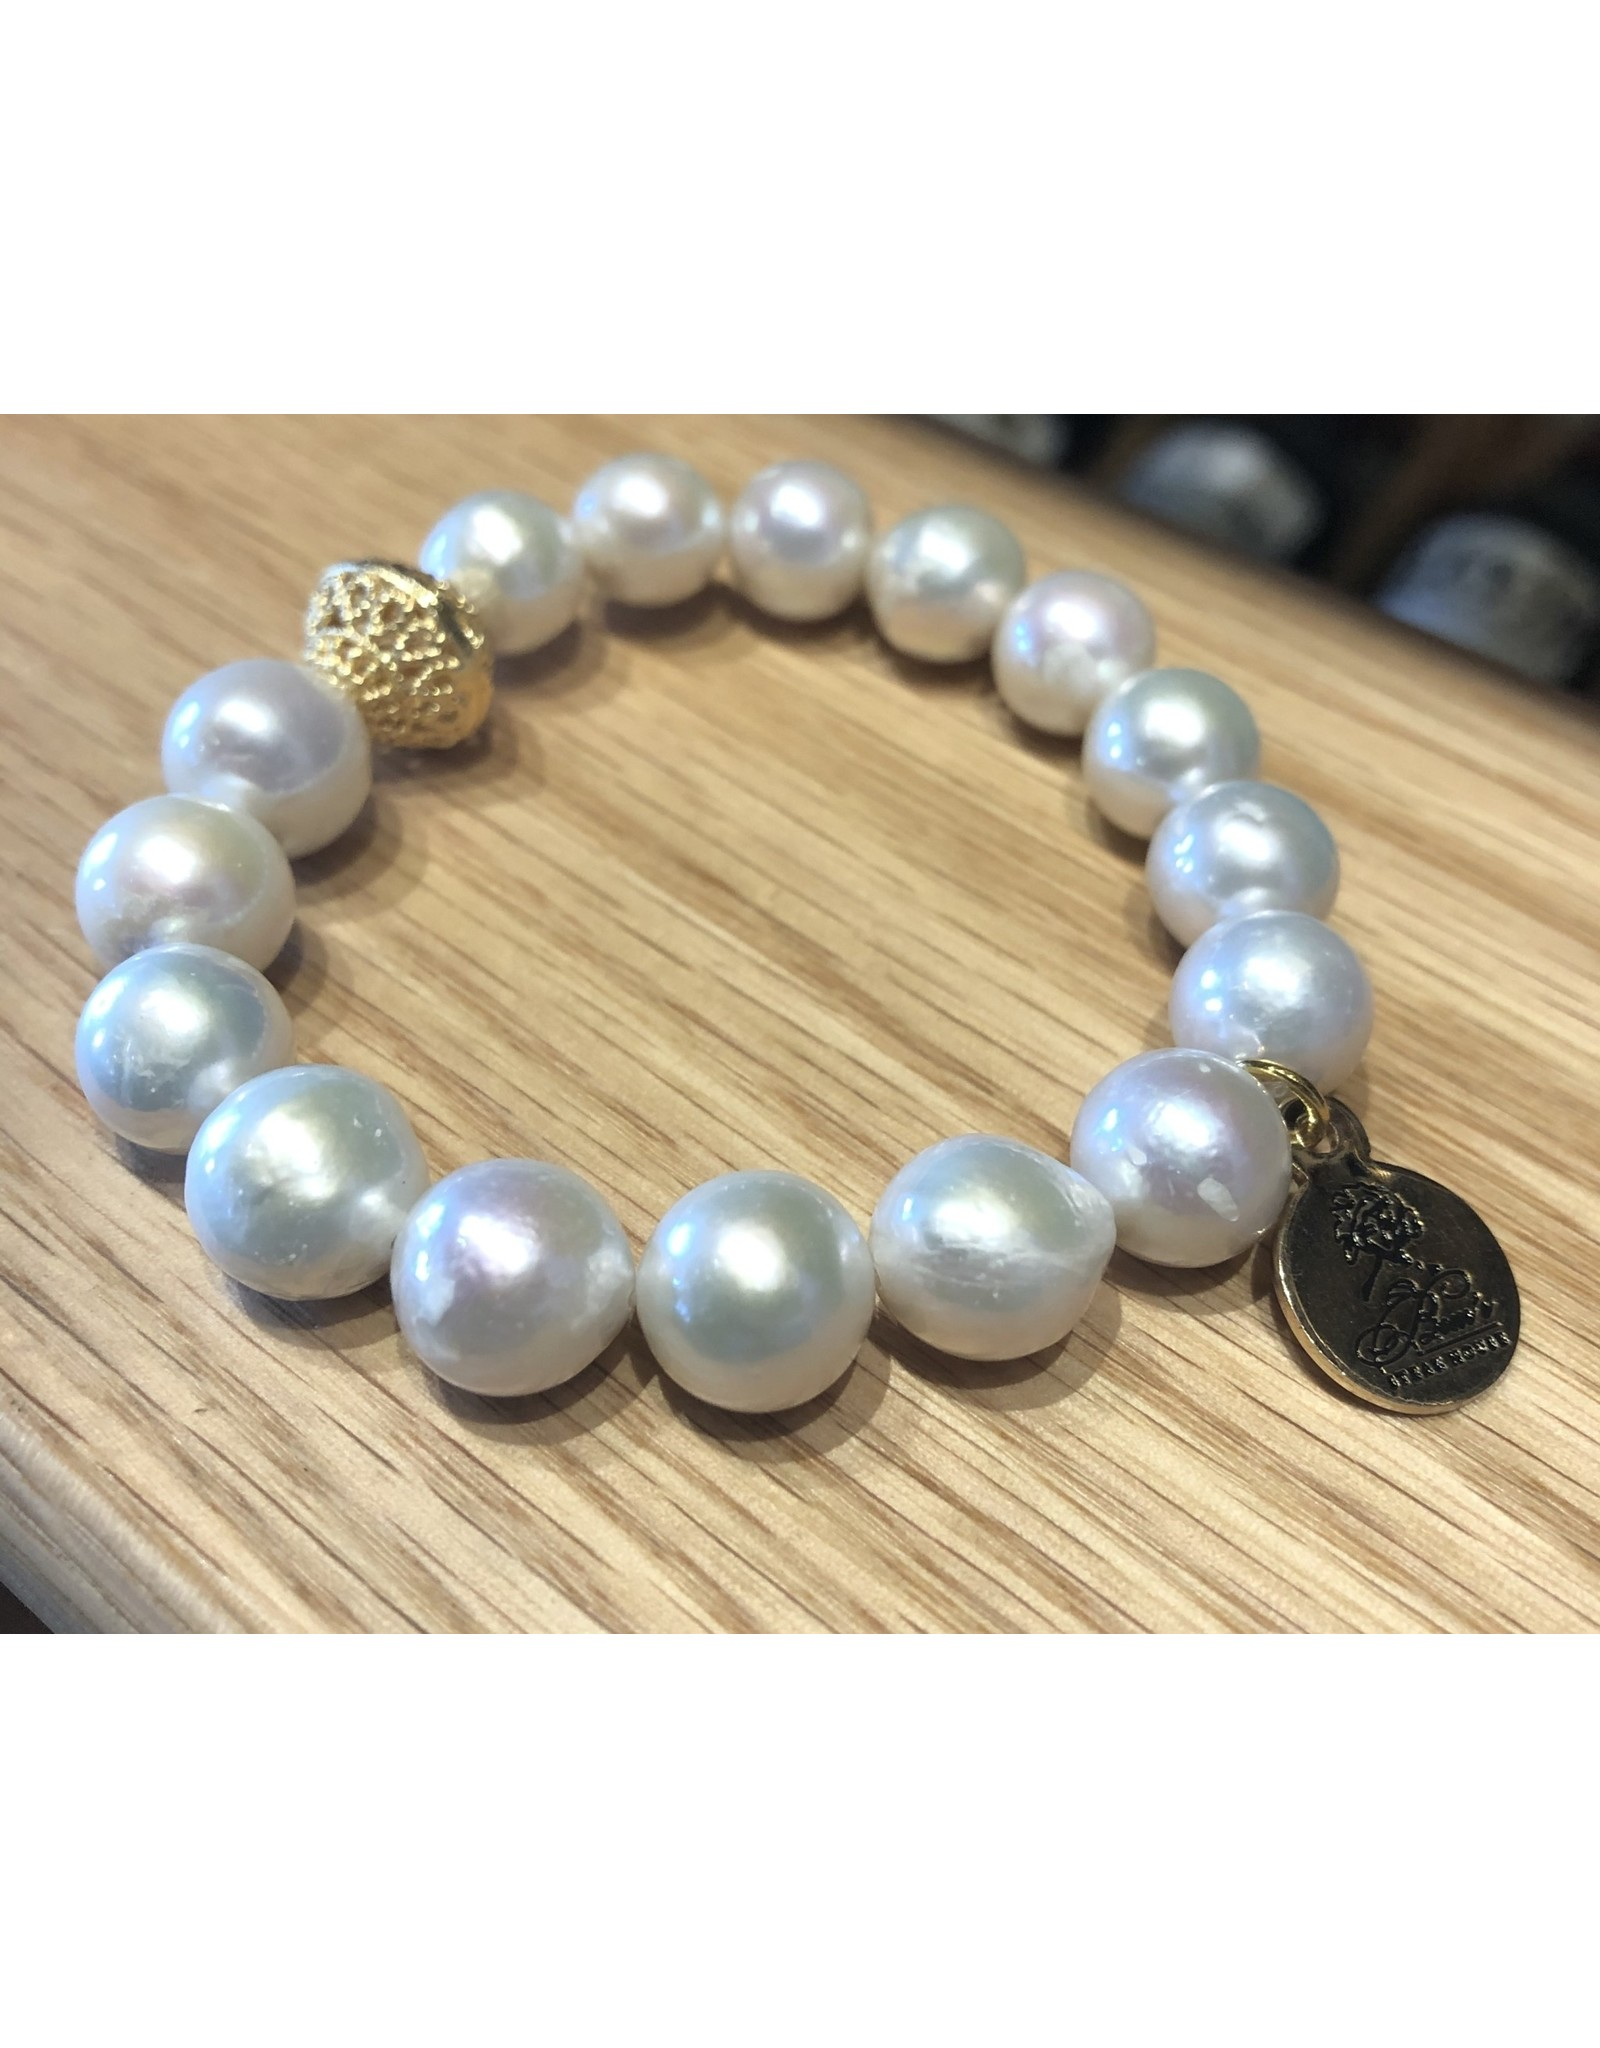 Bern's Evangeline Baroque Pearl Bracelet